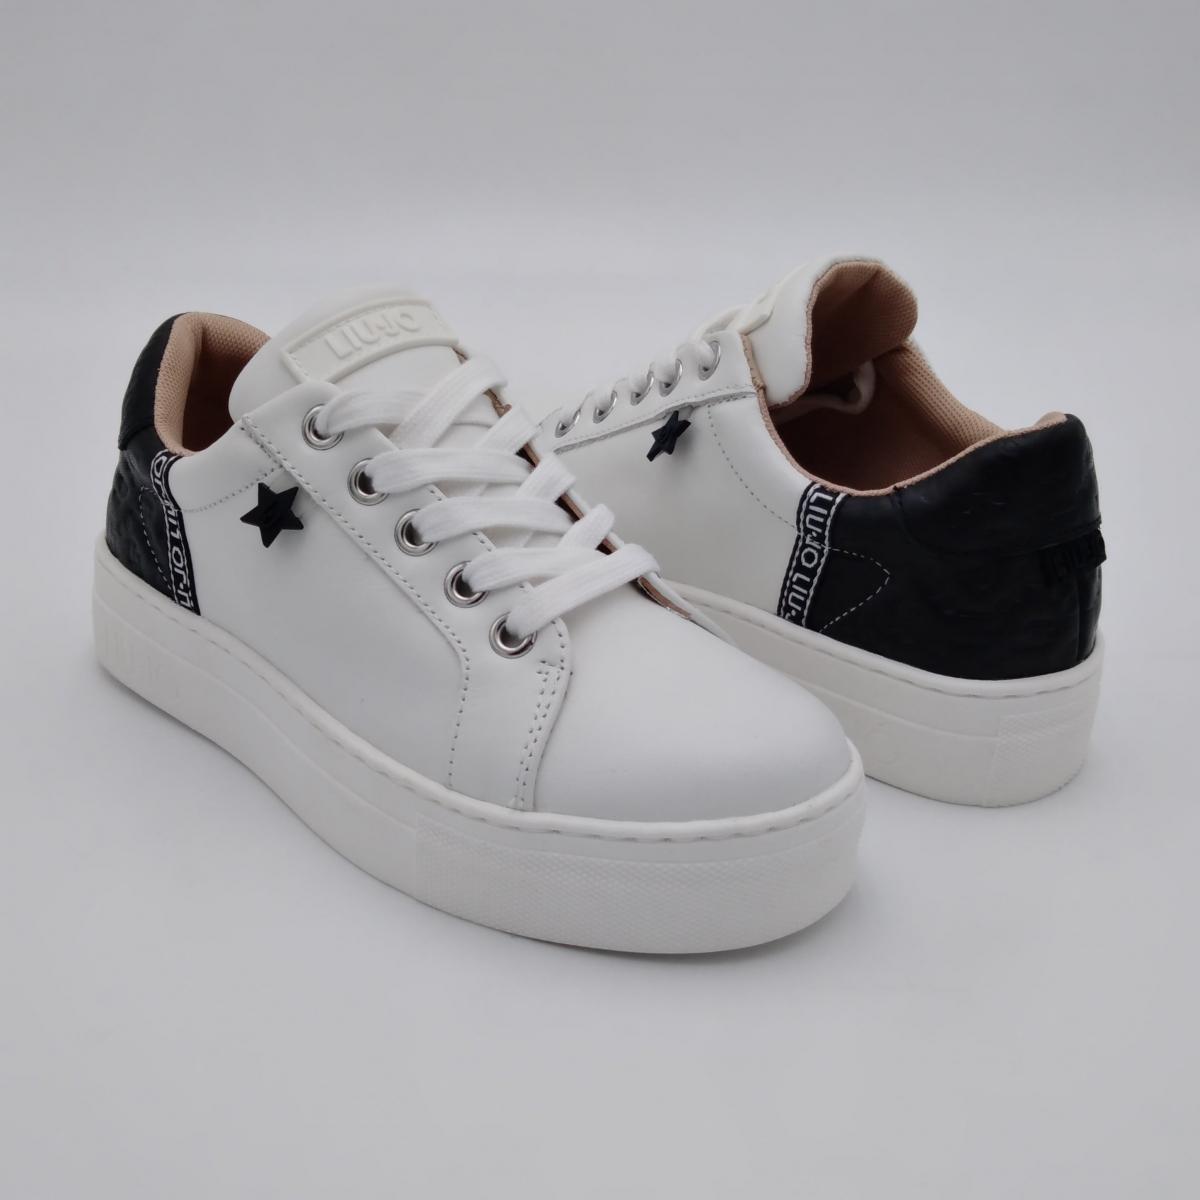 Liu Jo Alicia 11 -Sneaker...